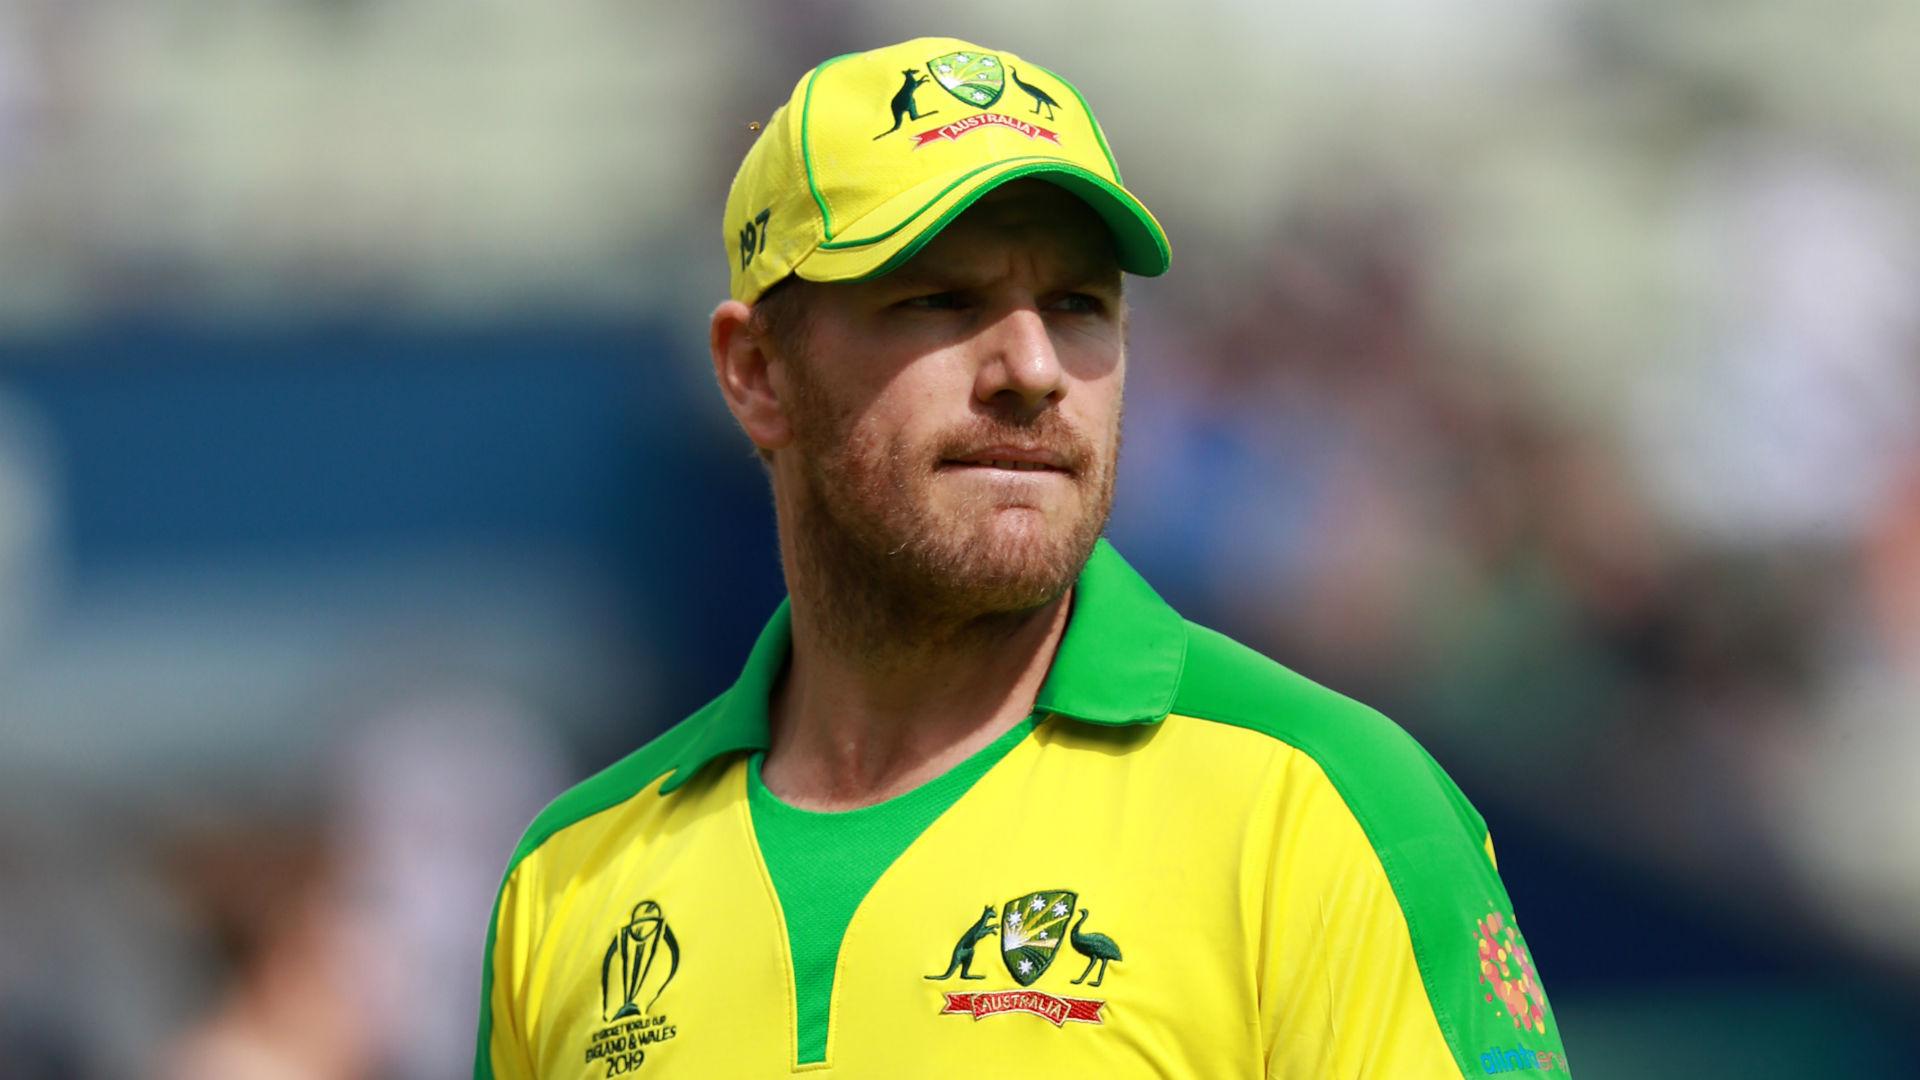 Australia win the toss and bat against England at Edgbaston